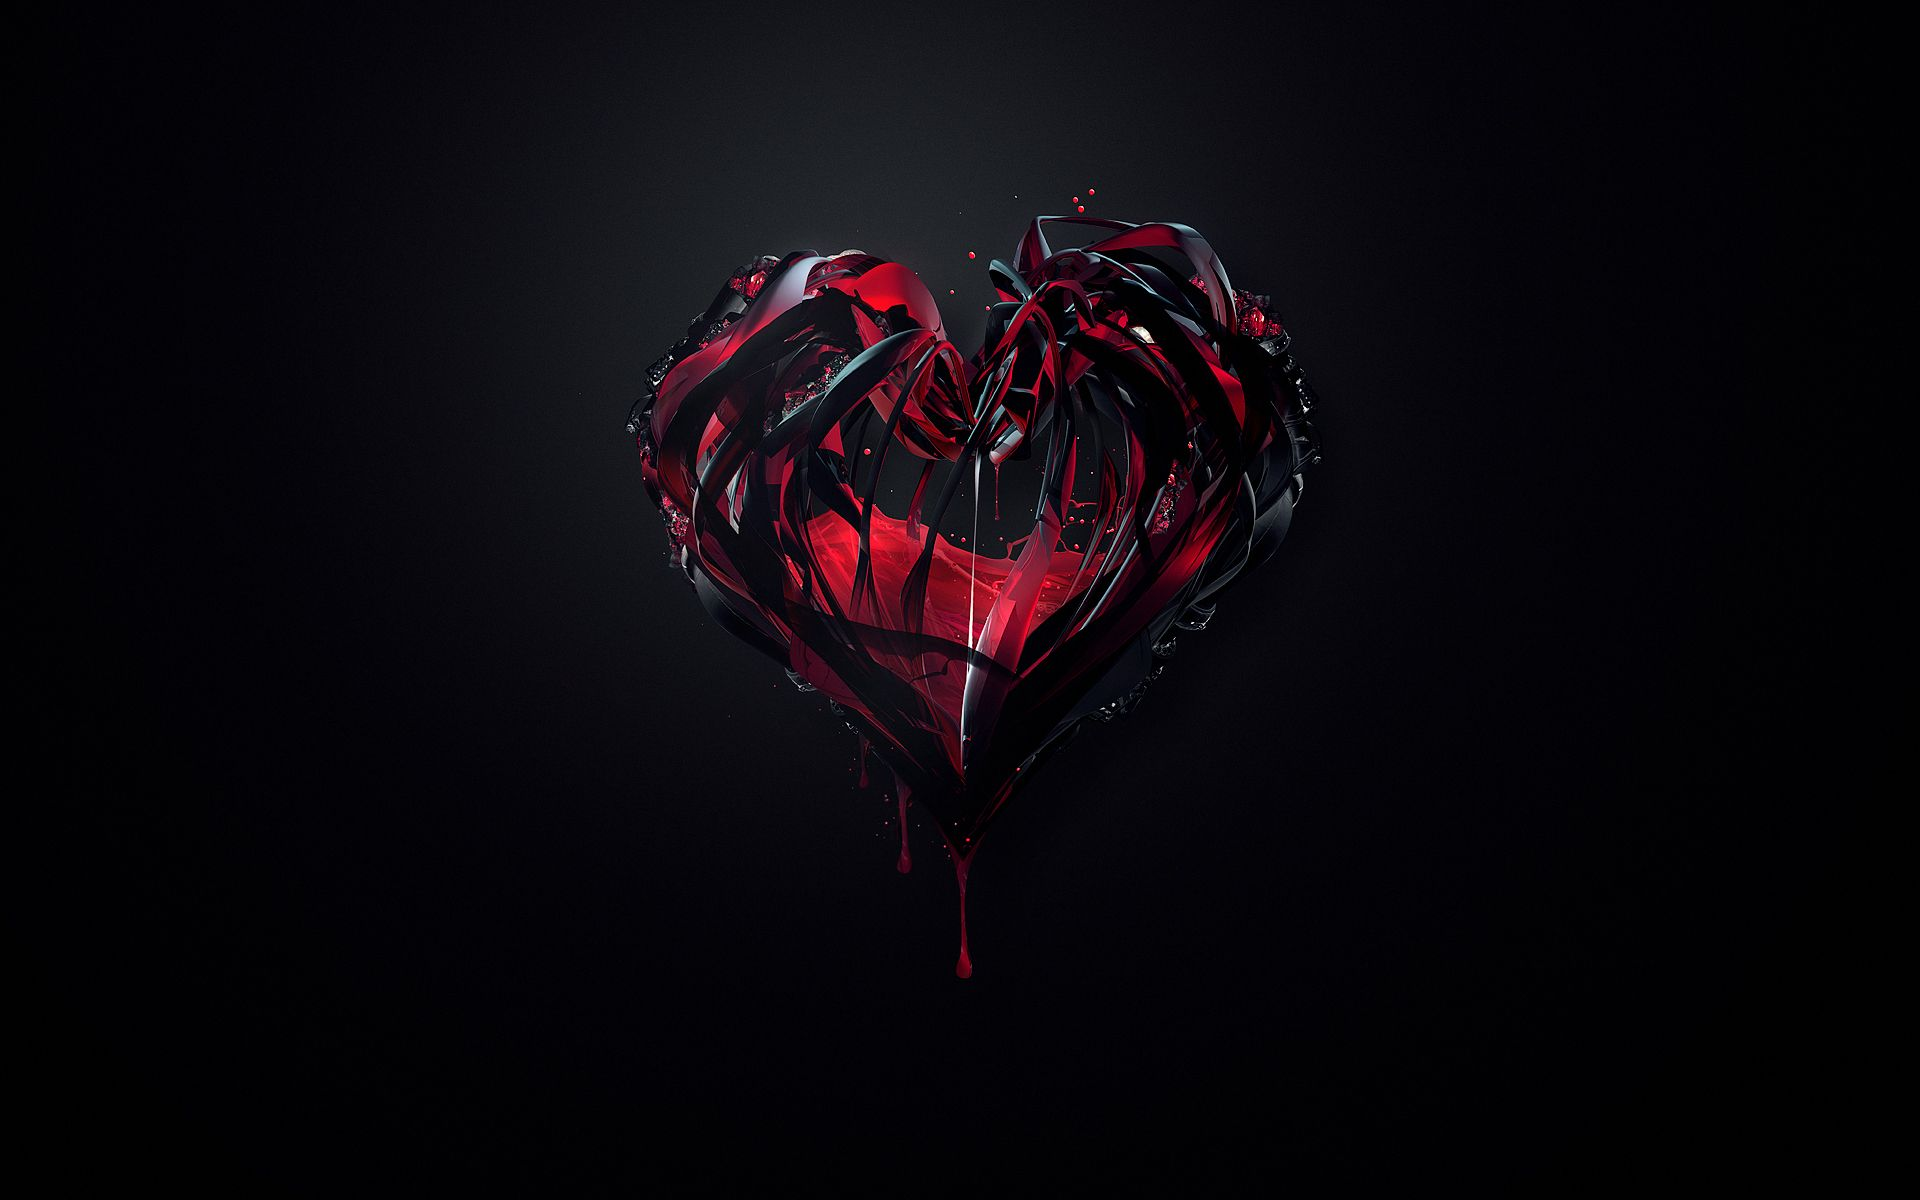 Pin By Roberta Guadarrama On Wallpapers Broken Heart Wallpaper Heart Wallpaper Android Wallpaper Black